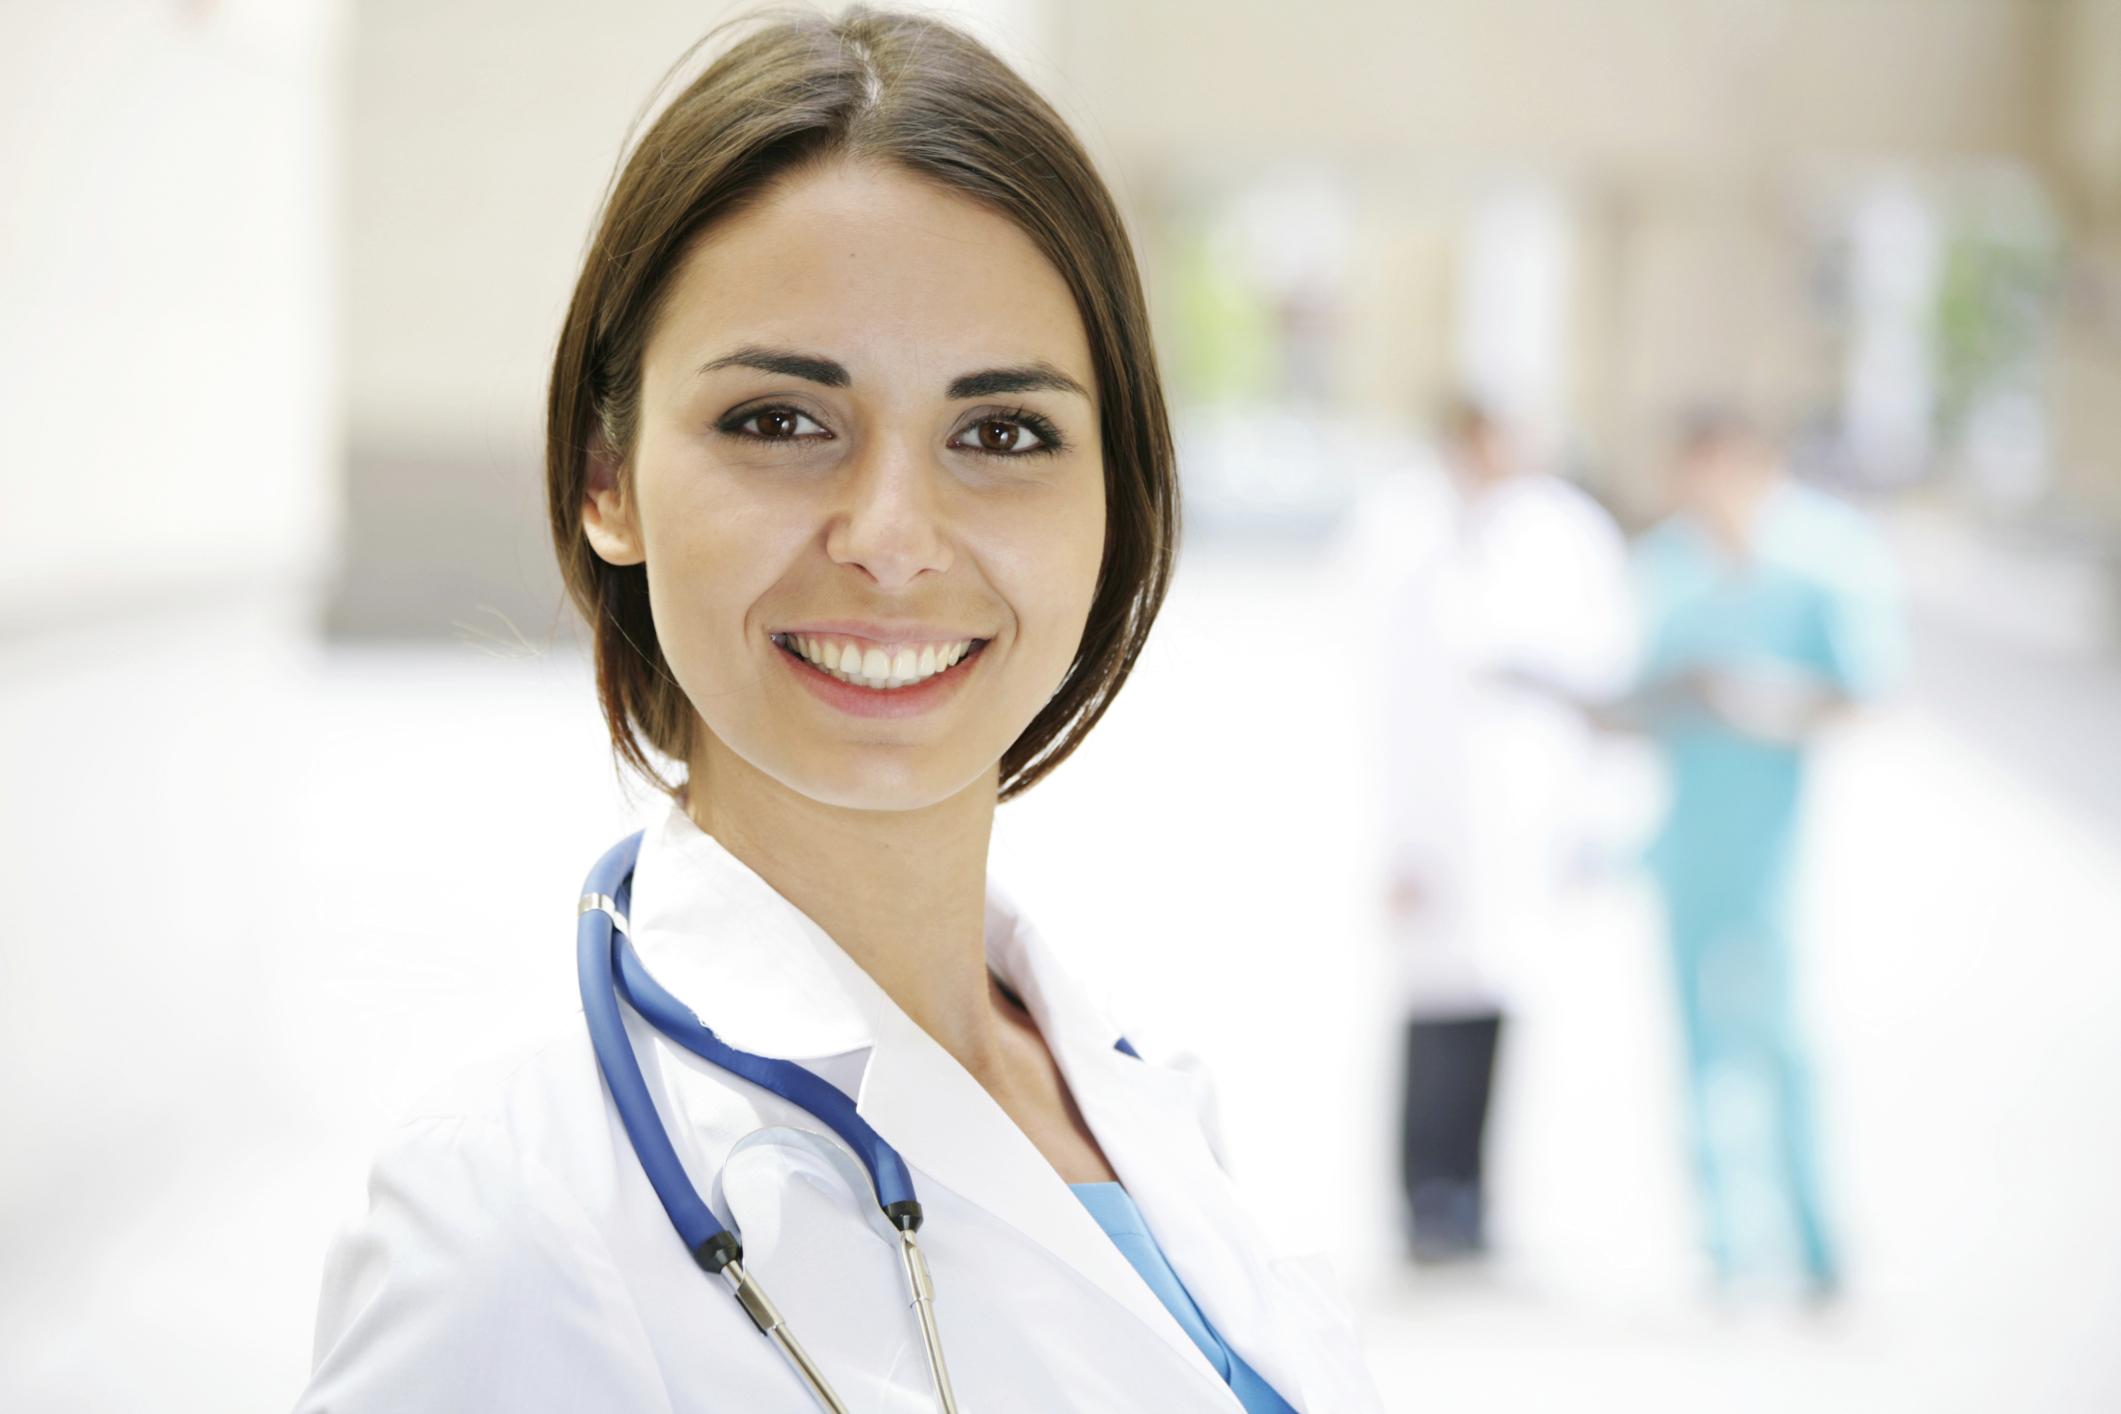 девушка фото у врача